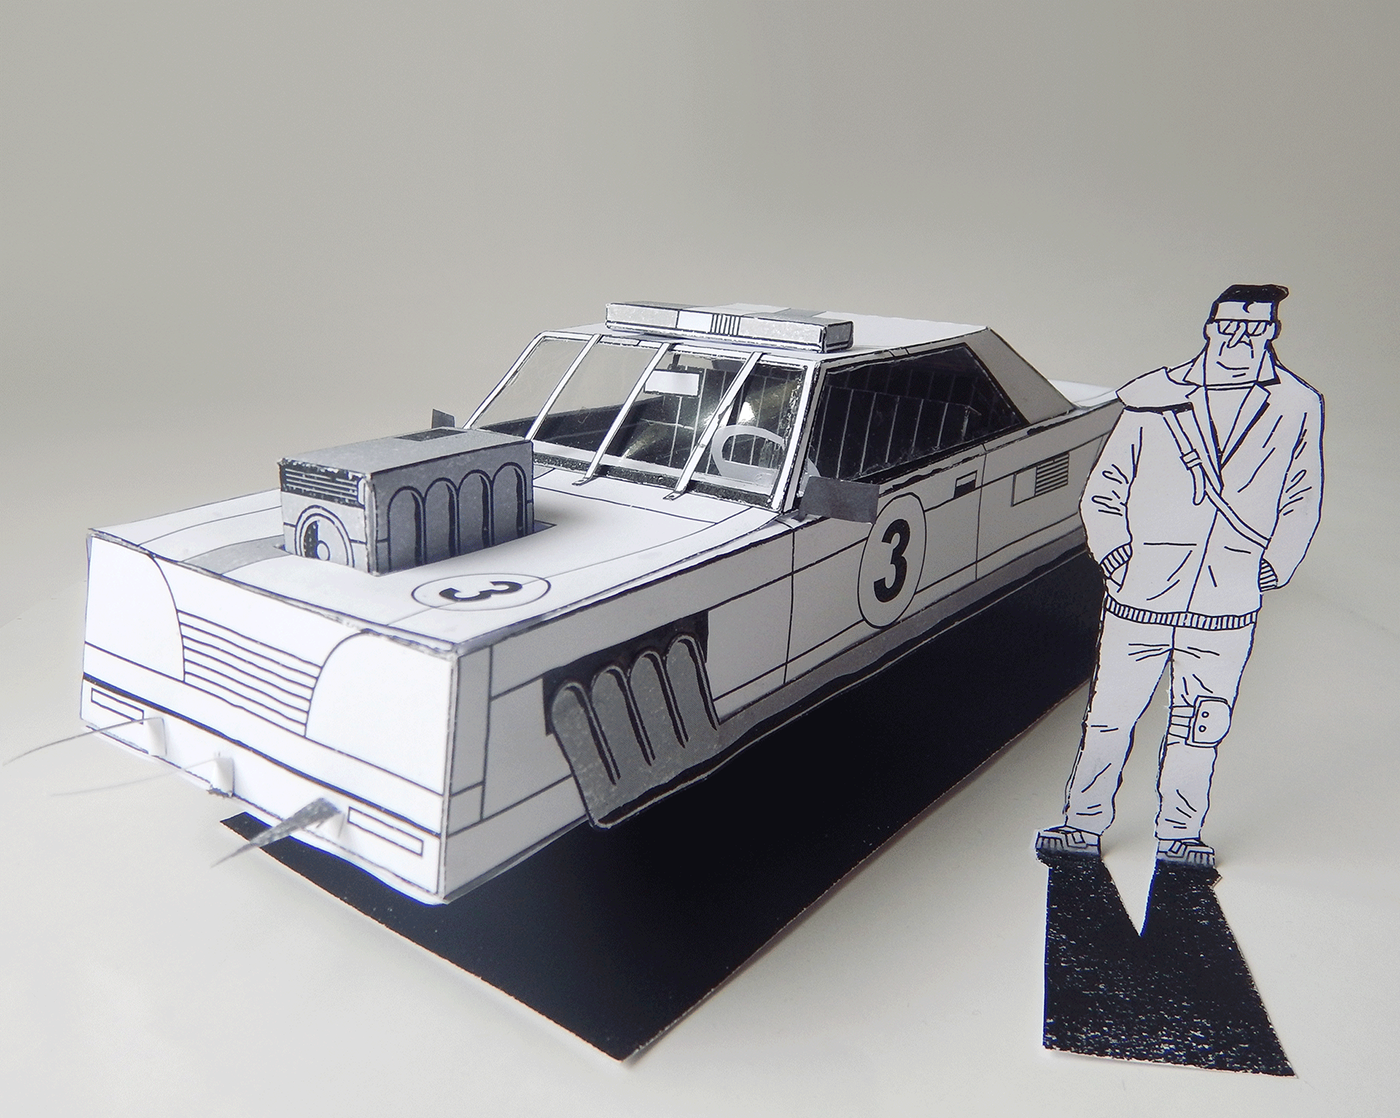 car comic futurodarko machine model paper Sculpt toy warrior wasteland